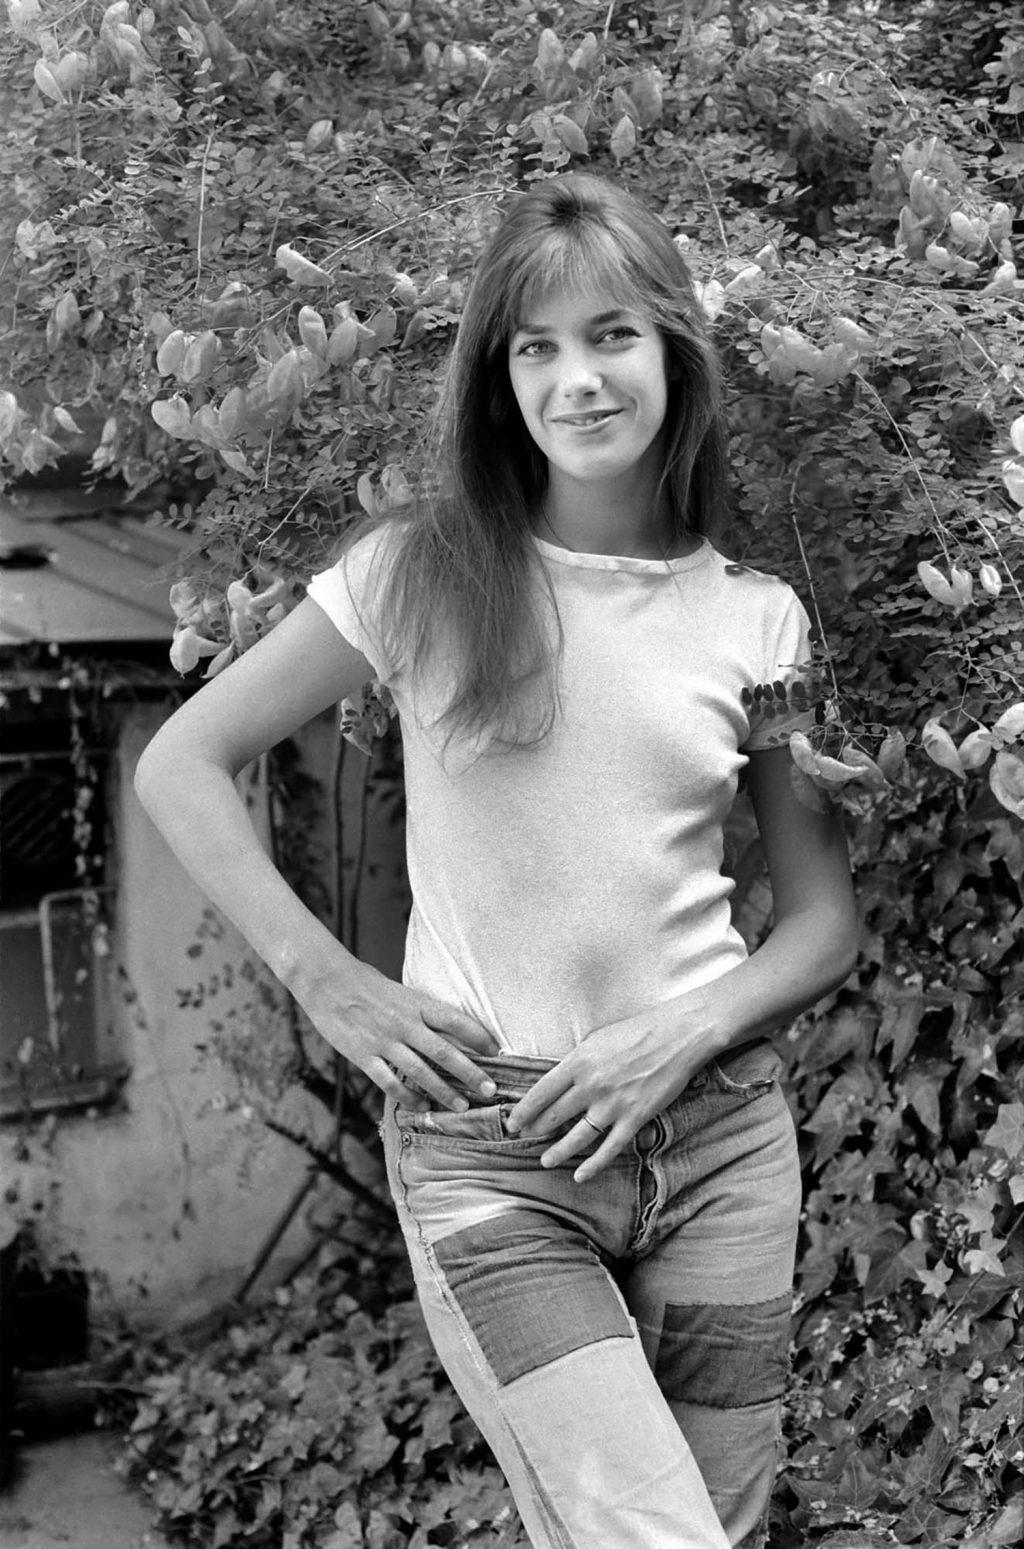 áo thun trắng ngắn tay Jane Birkin